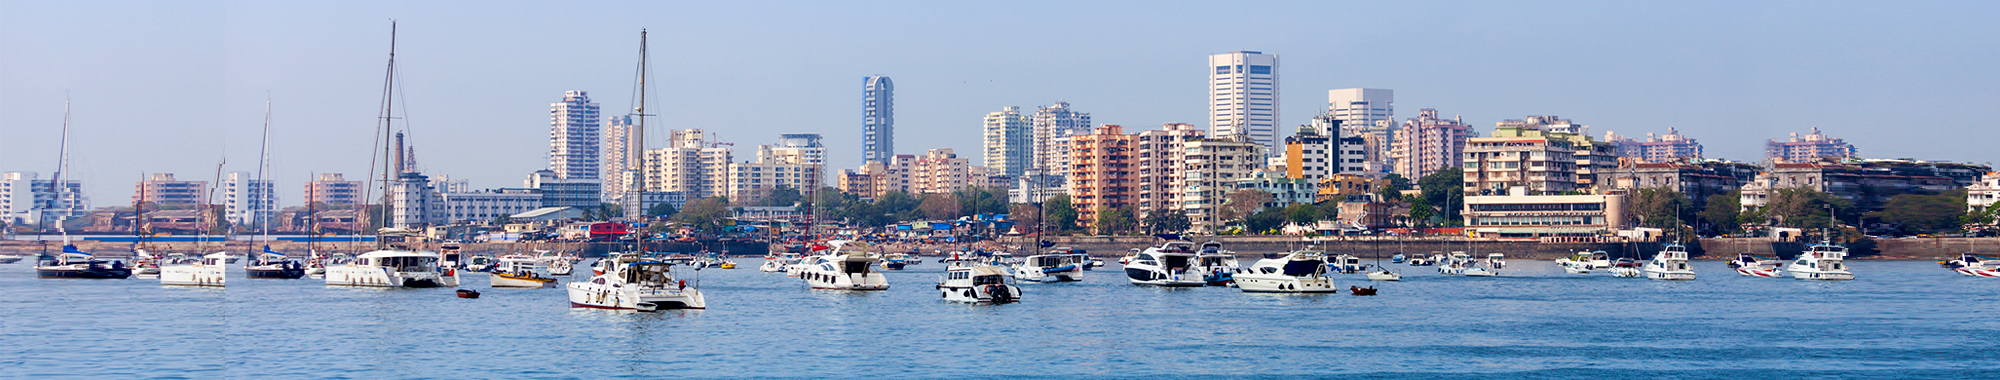 dexterMT-header-skyline-Mumbai